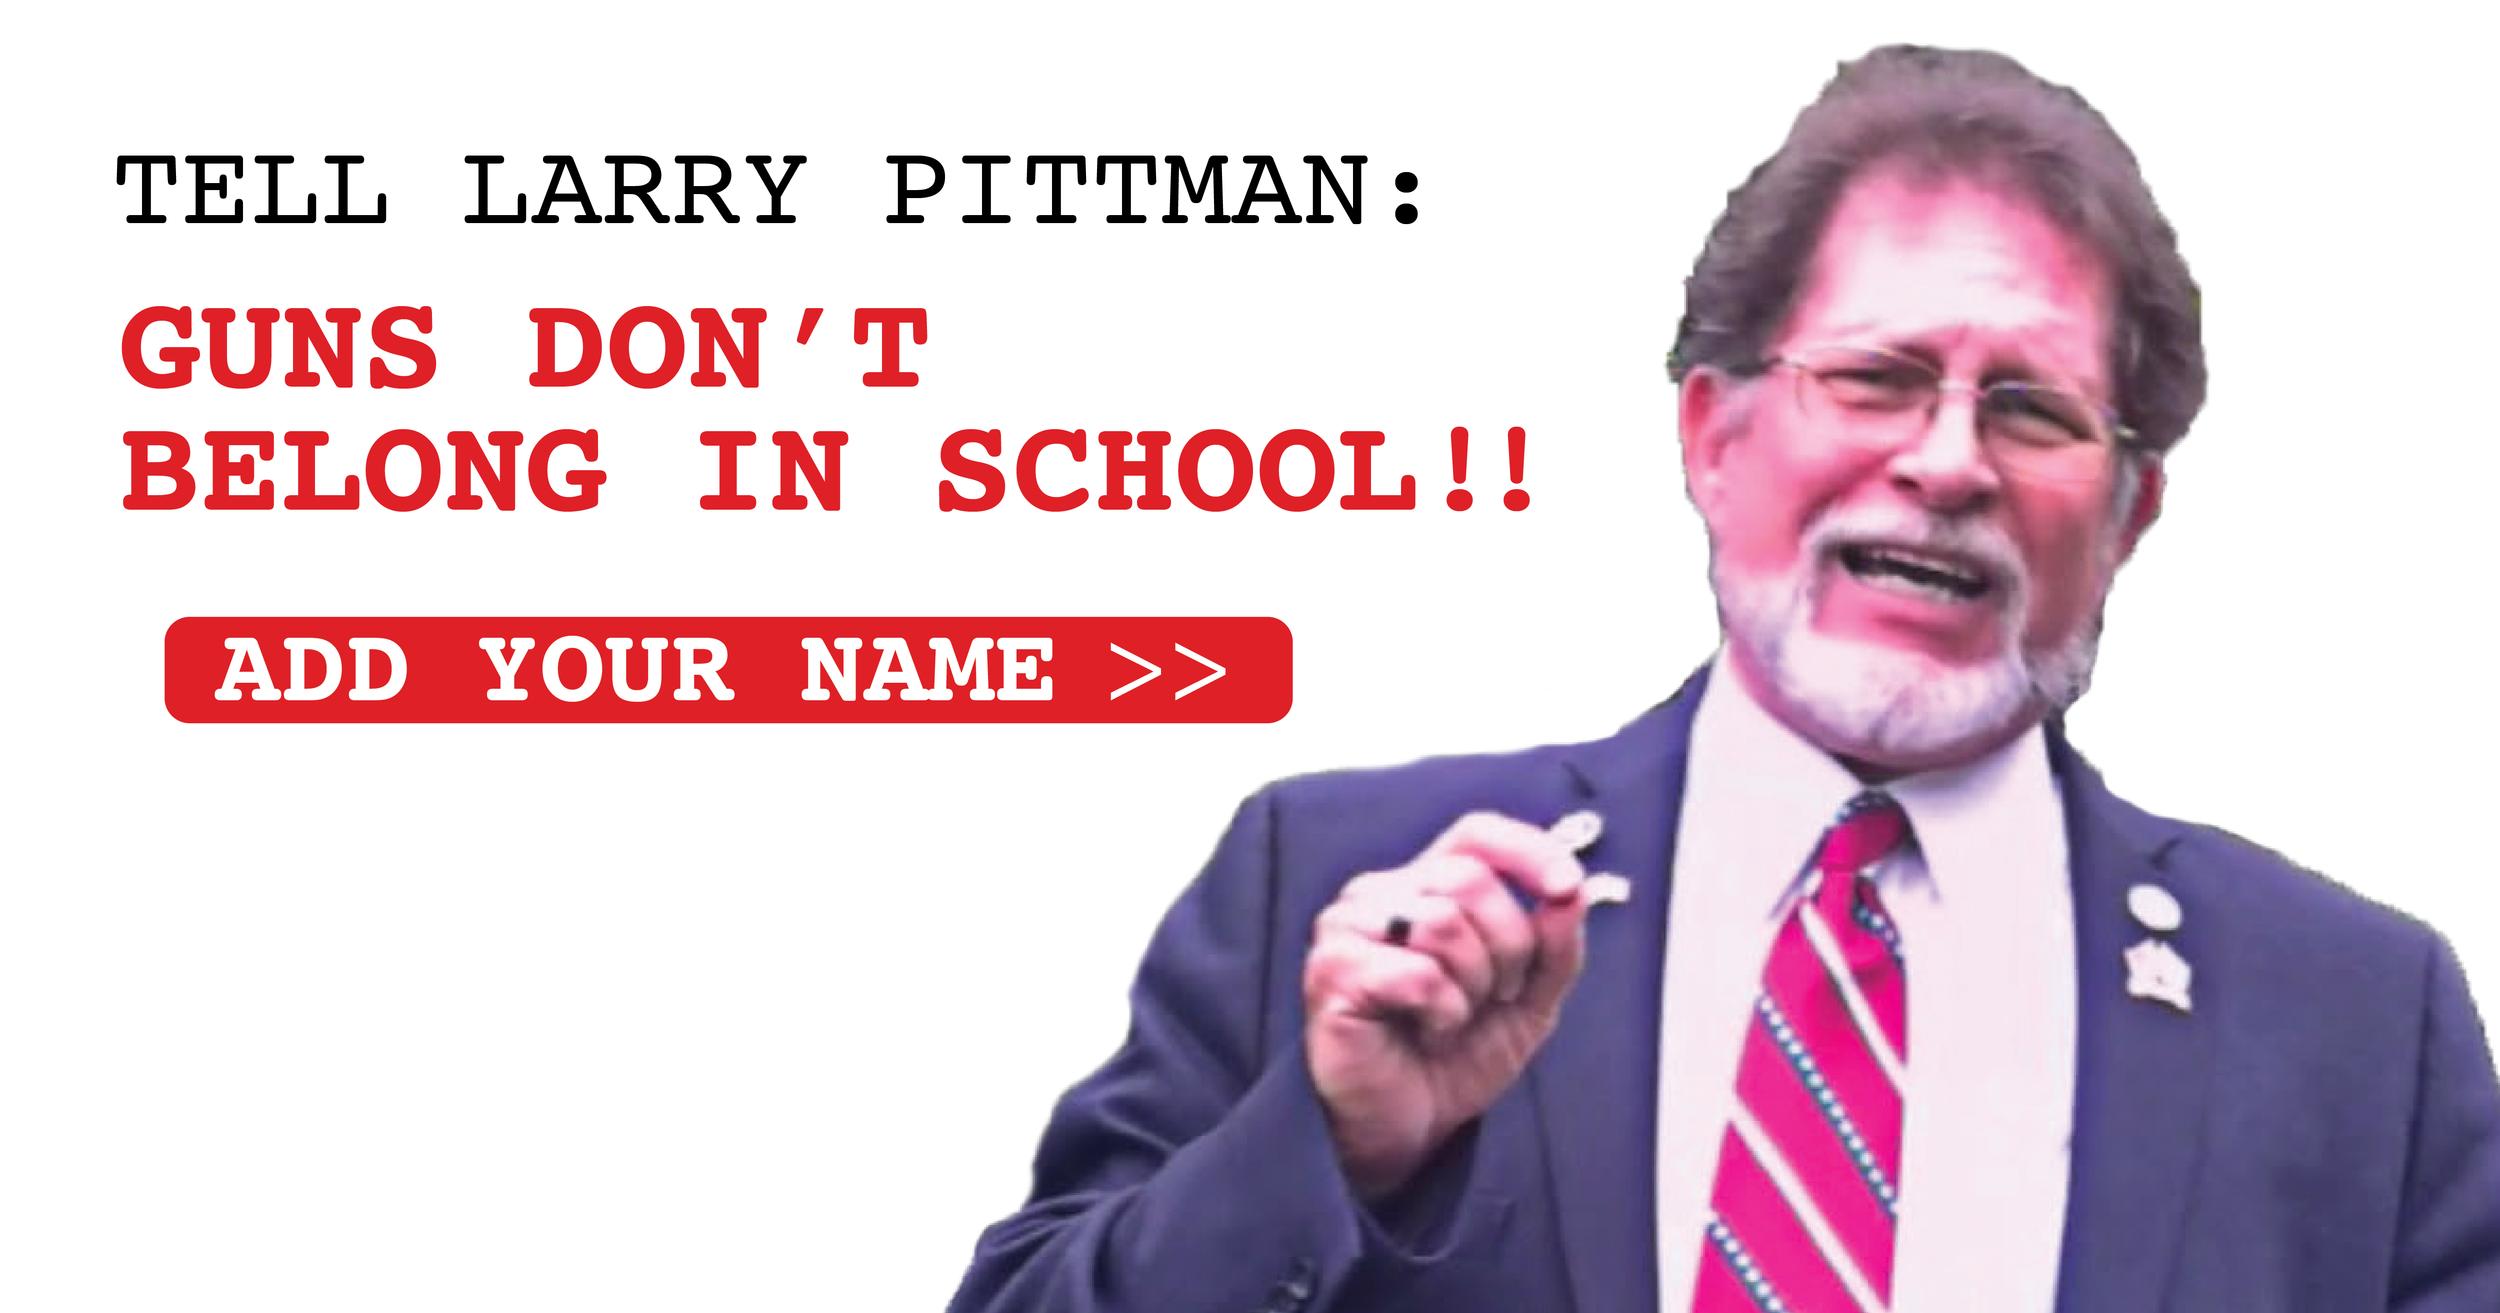 03-01 Pittman-01-01-01.png